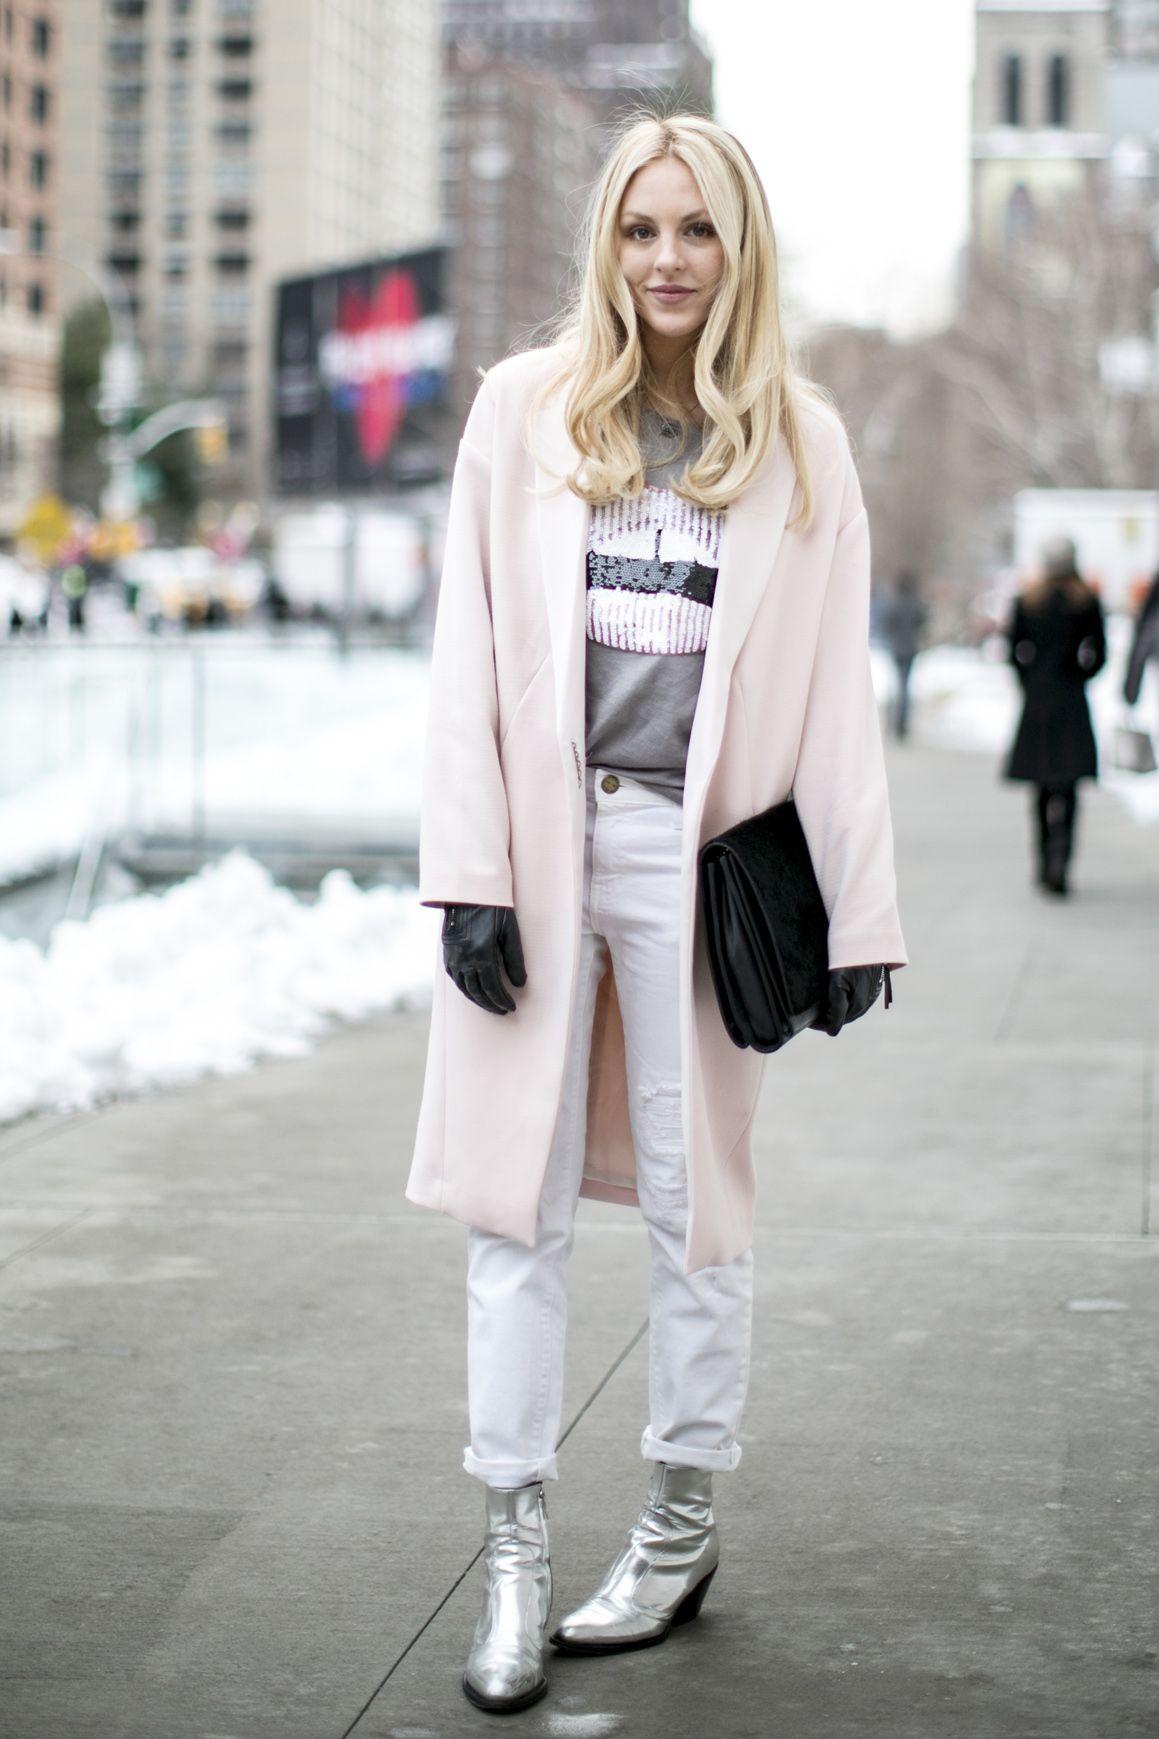 Watch - Stylish look in winter video